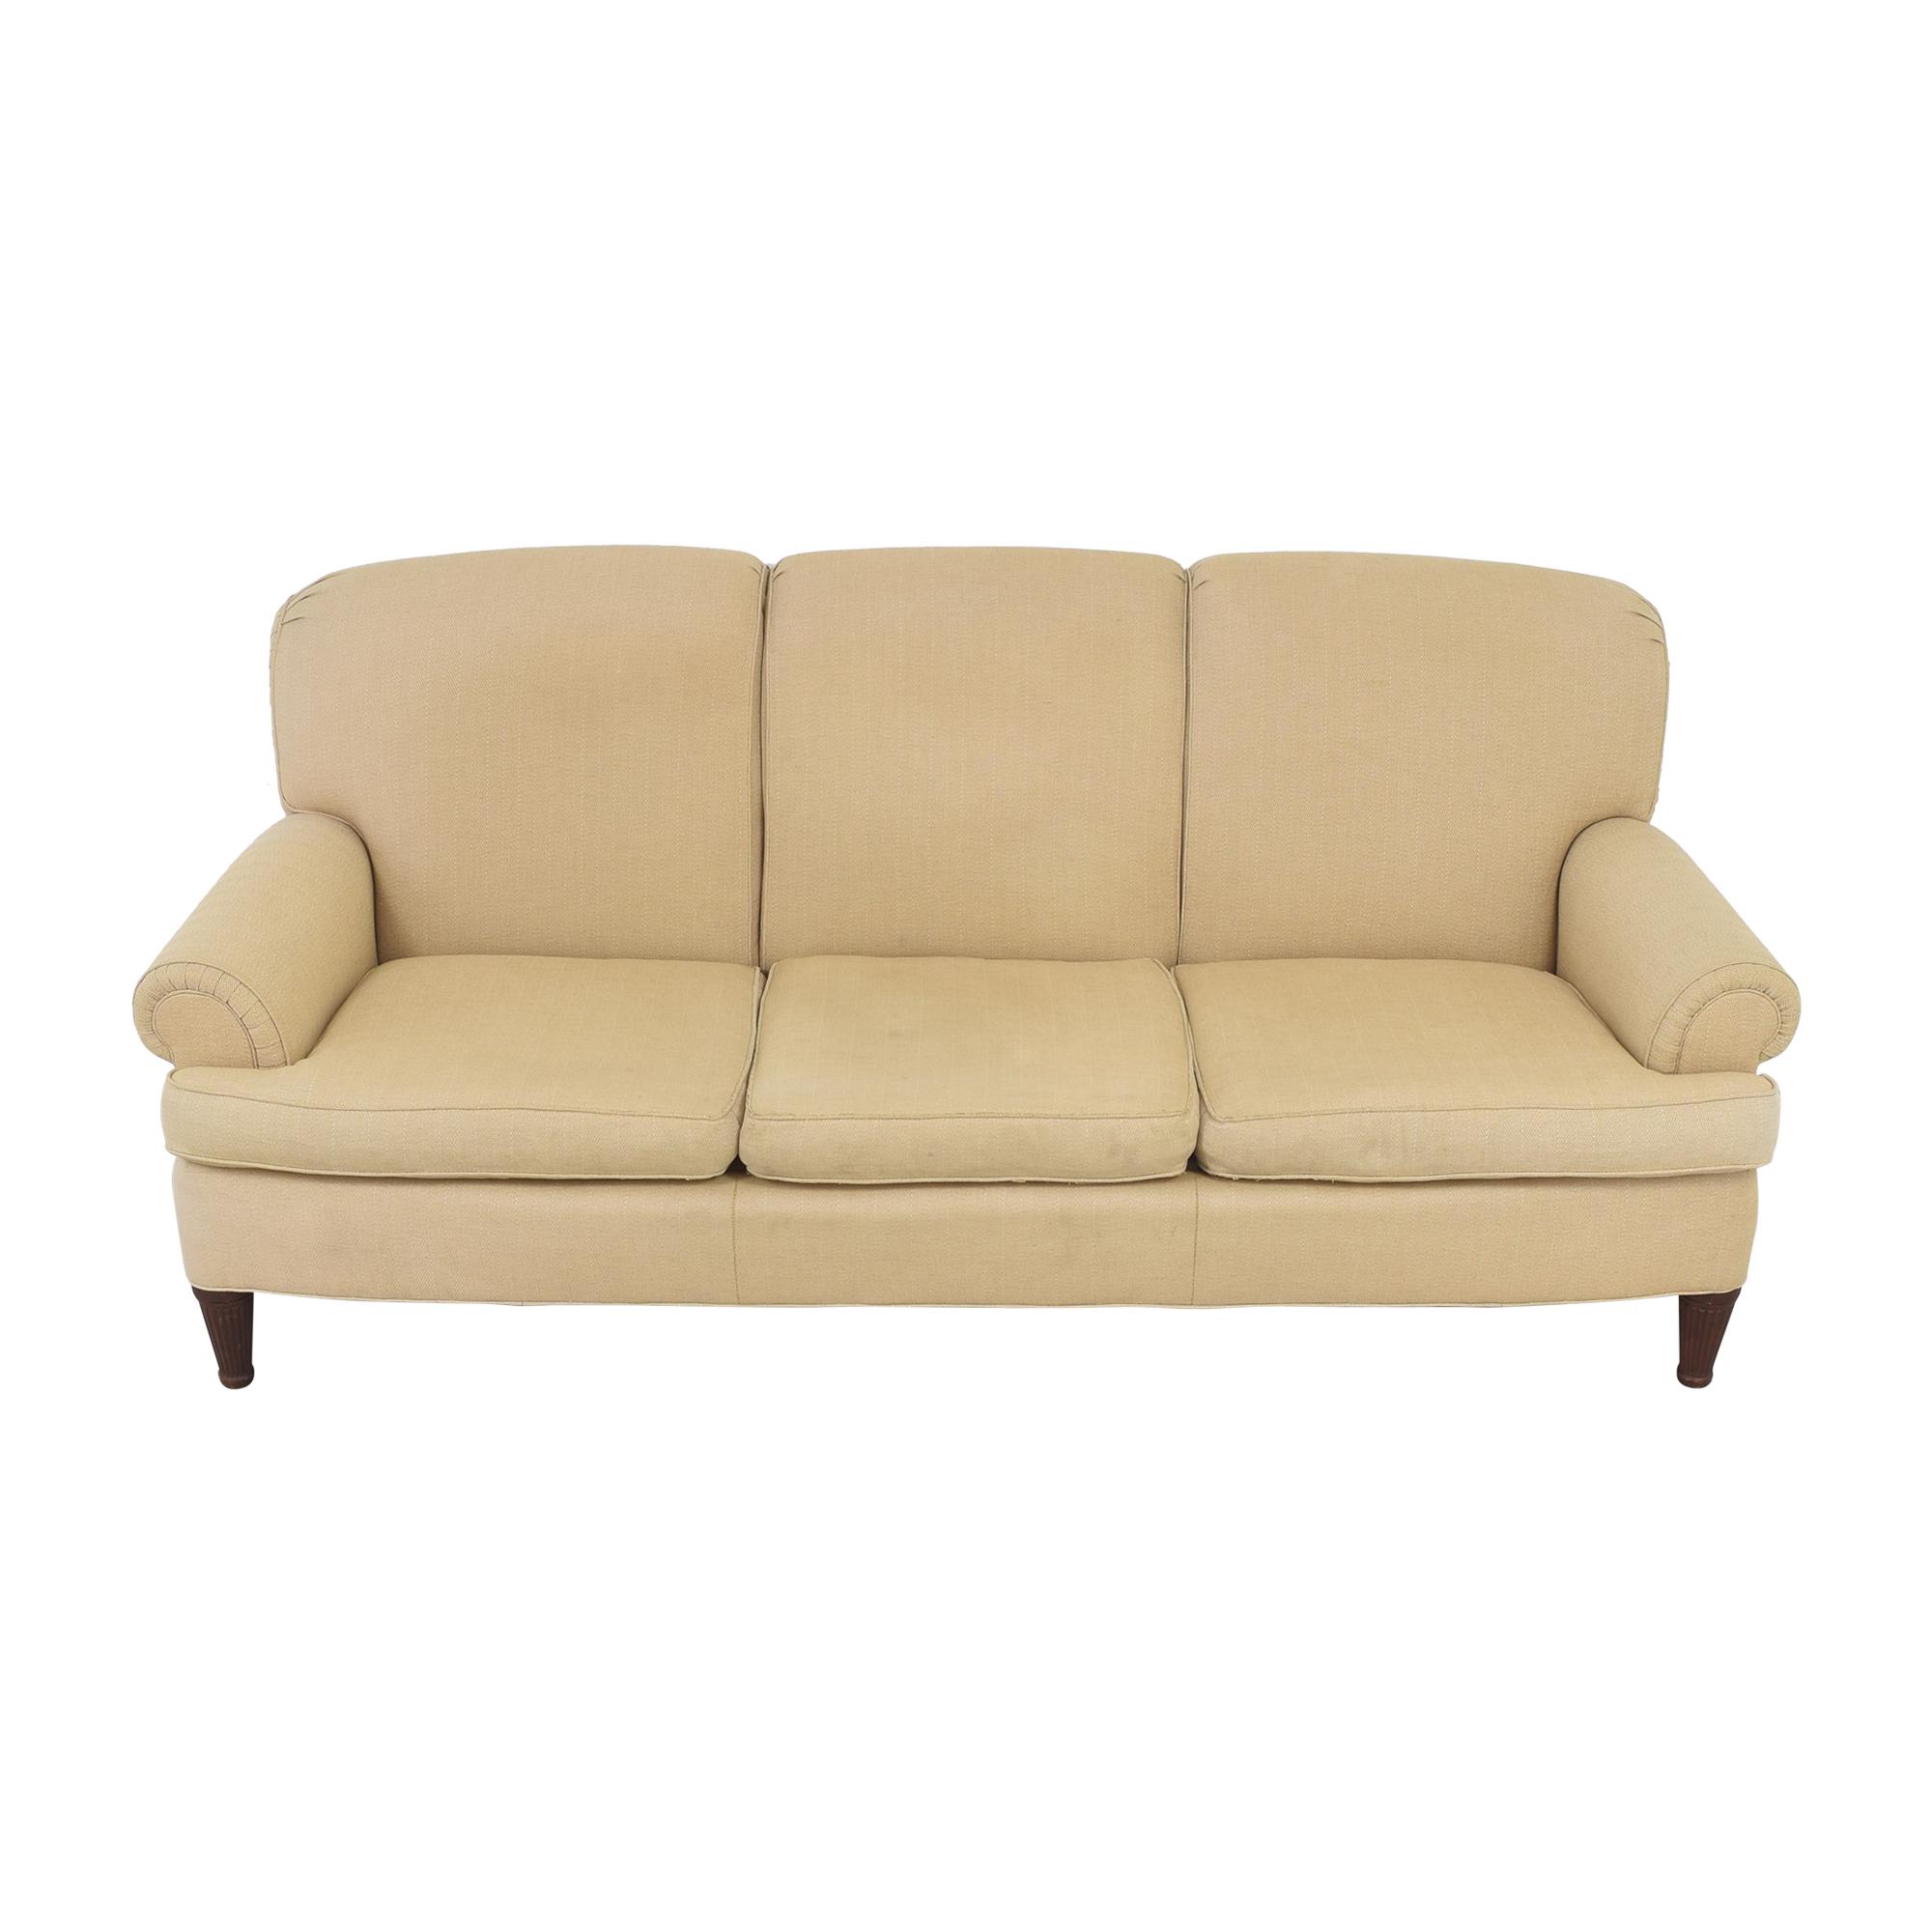 Ralph Lauren Home Ralph Lauren Upholstered Roll Arm Sofa dimensions